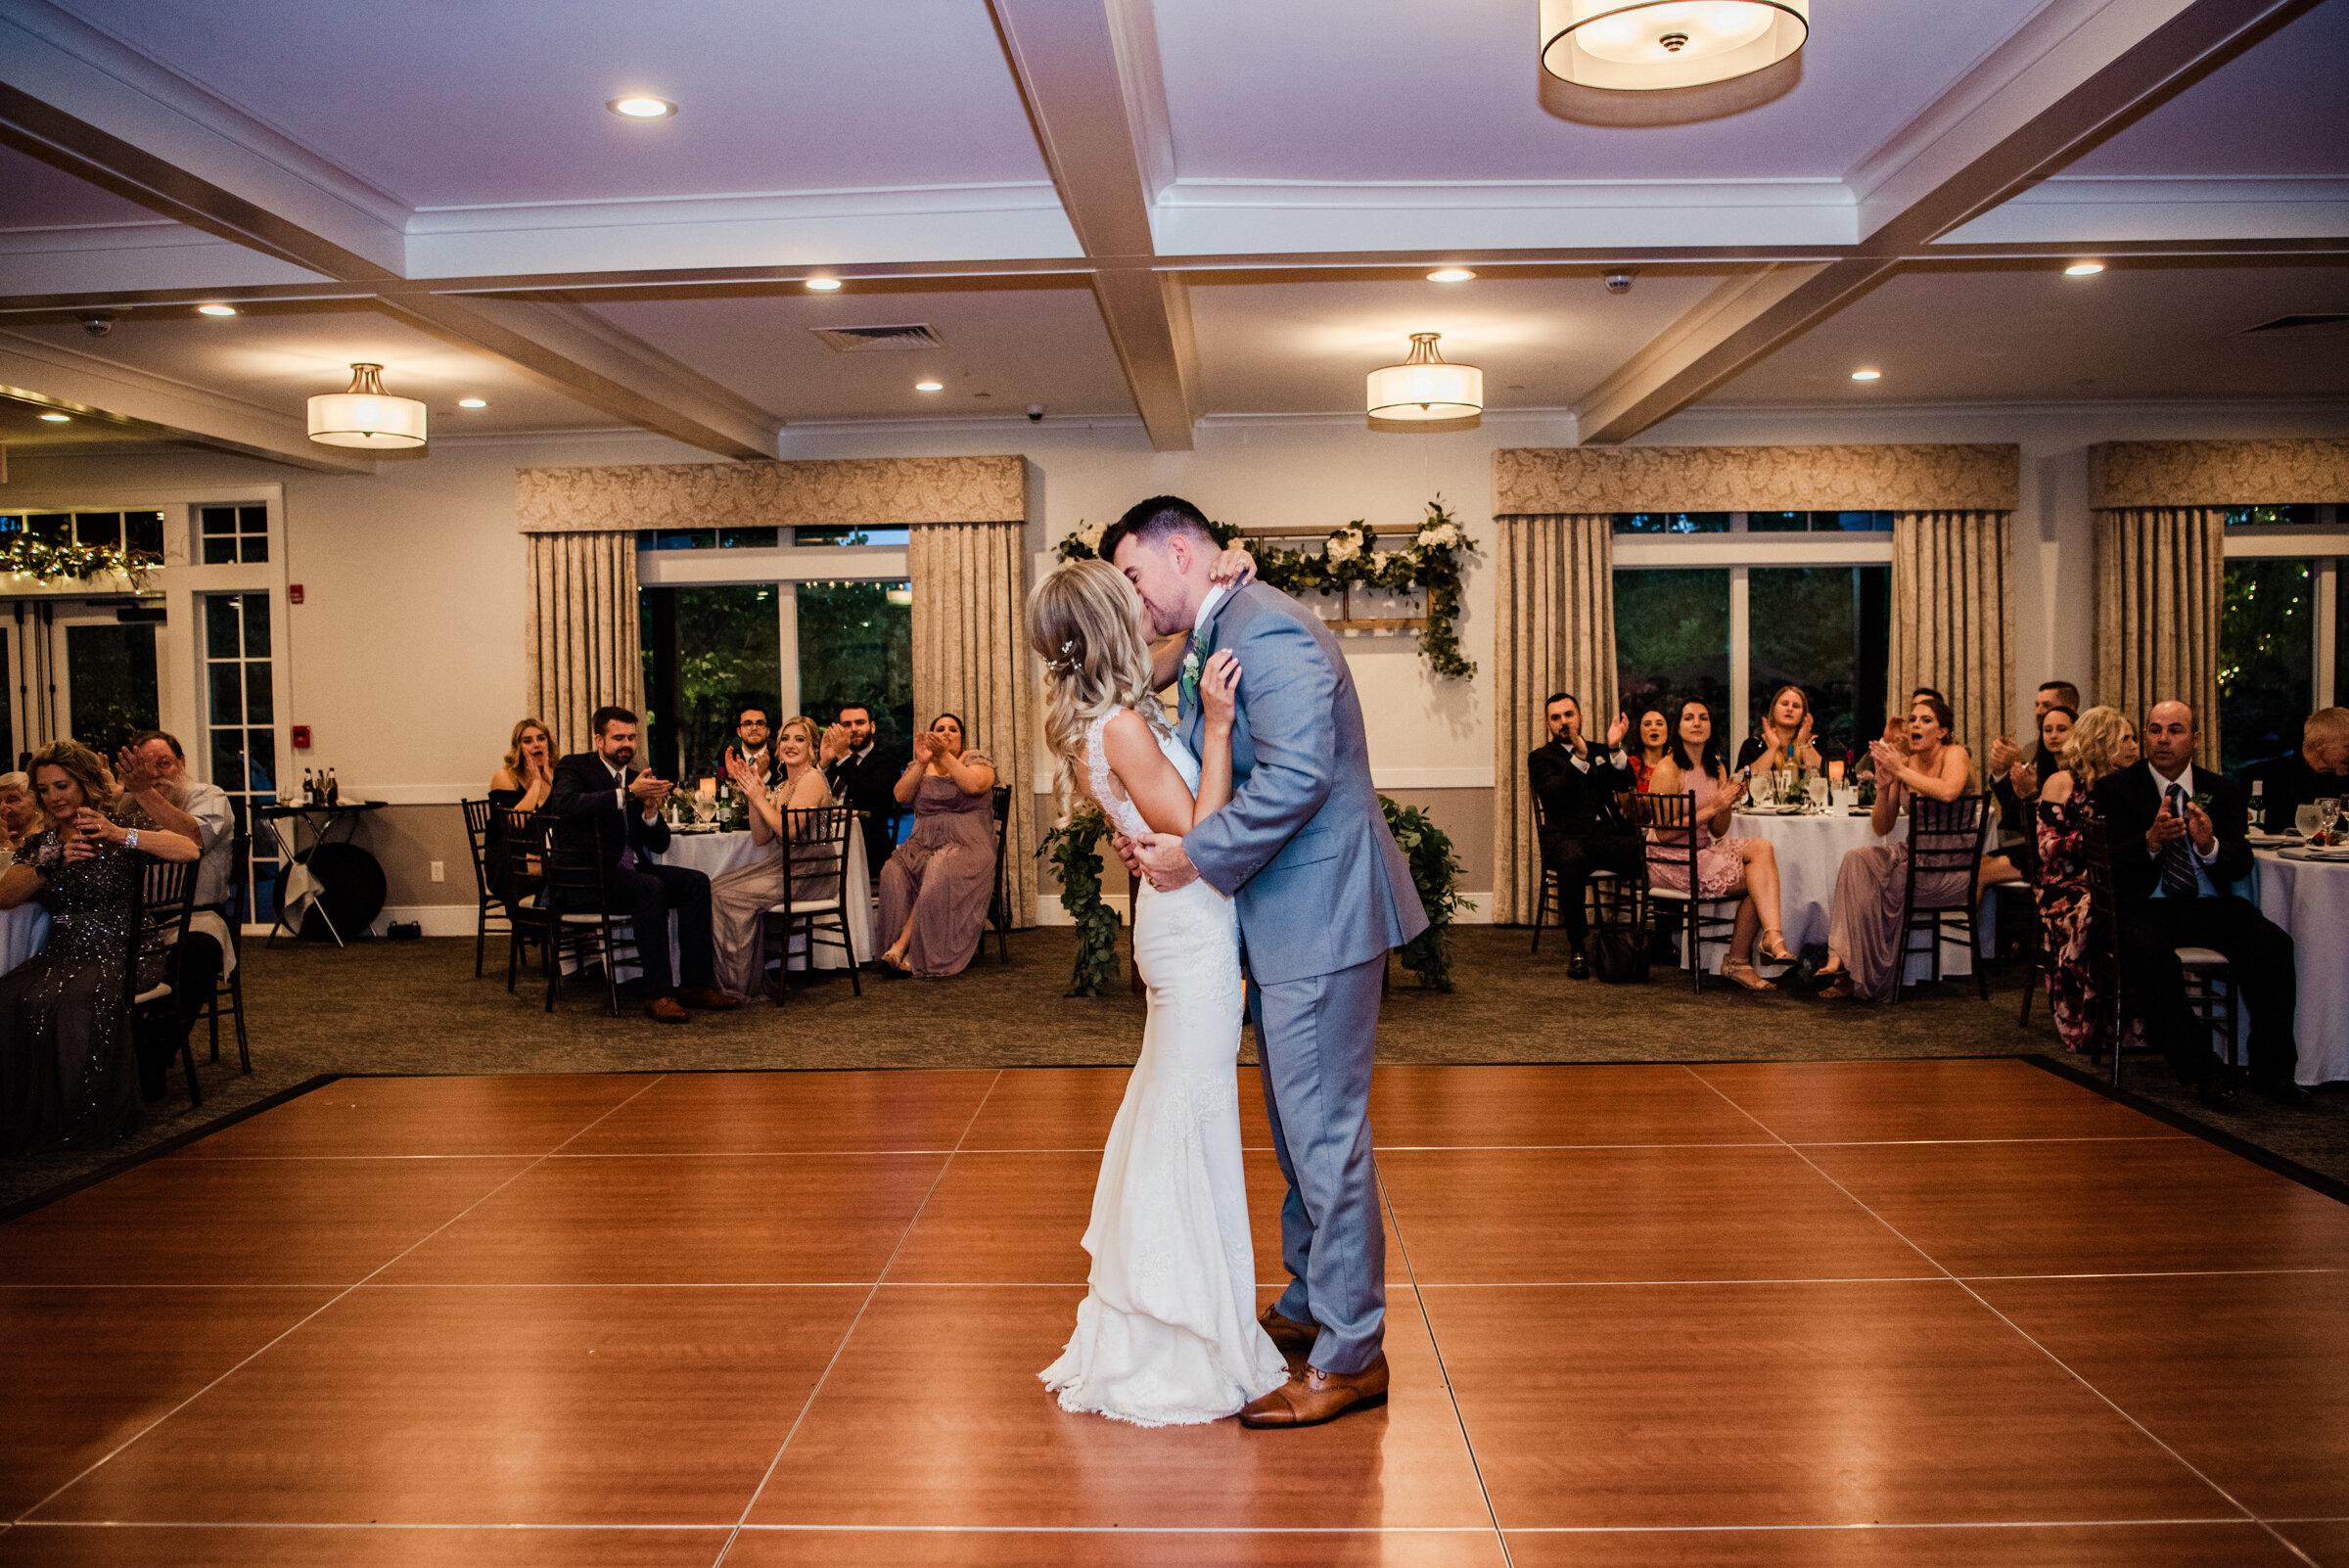 Deerfield_Country_Club_Rochester_Wedding_JILL_STUDIO_Rochester_NY_Photographer_DSC_7147.jpg